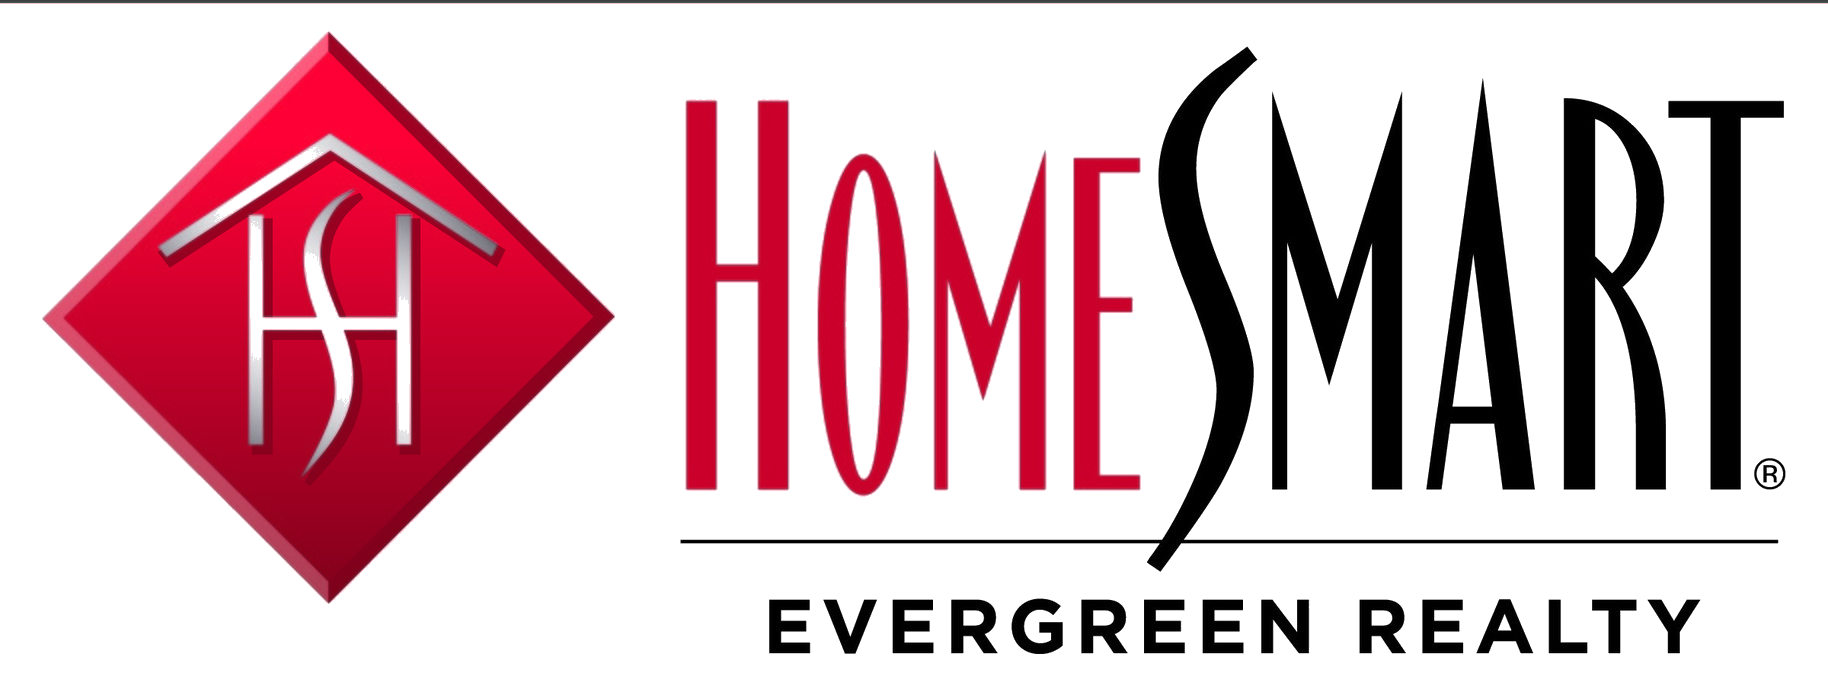 #1 Real Estate Service in Orange County